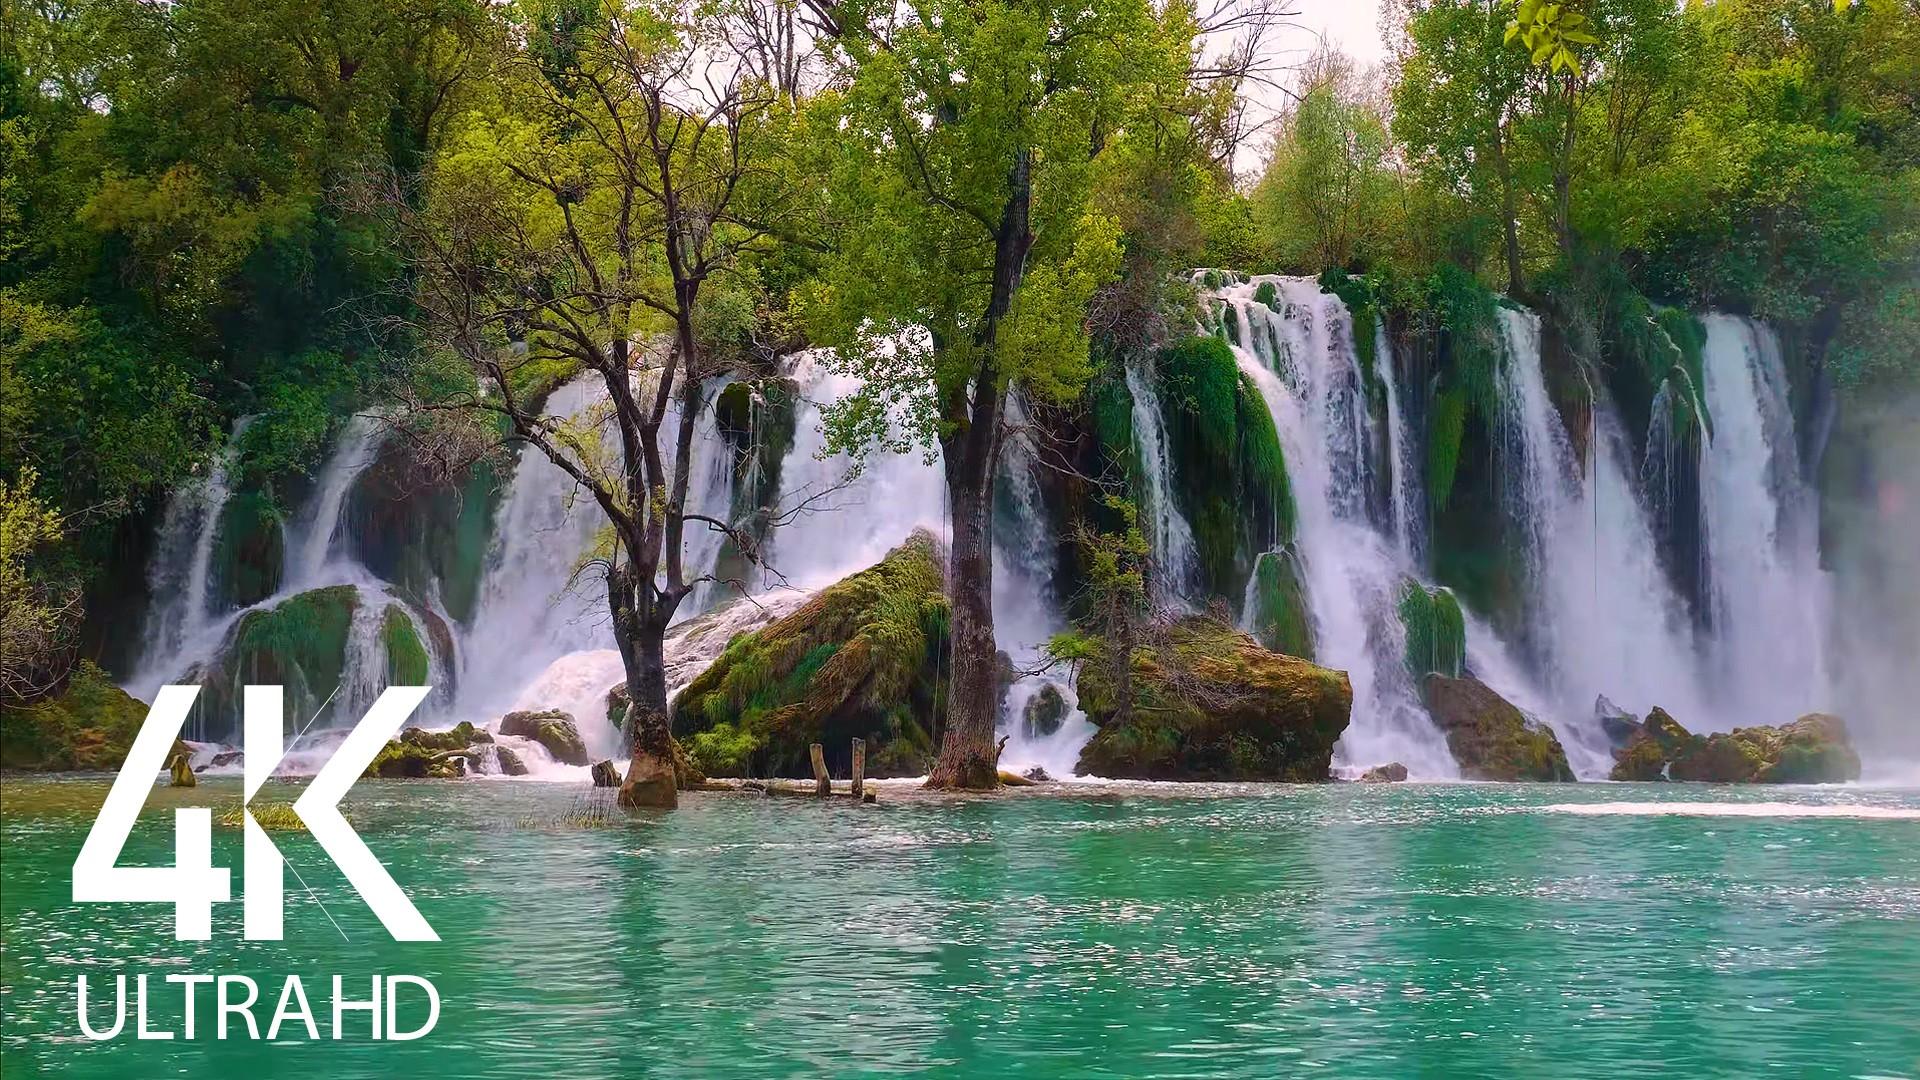 Bosnia and Herzegovina The waterfalls of Jajce and Kravica